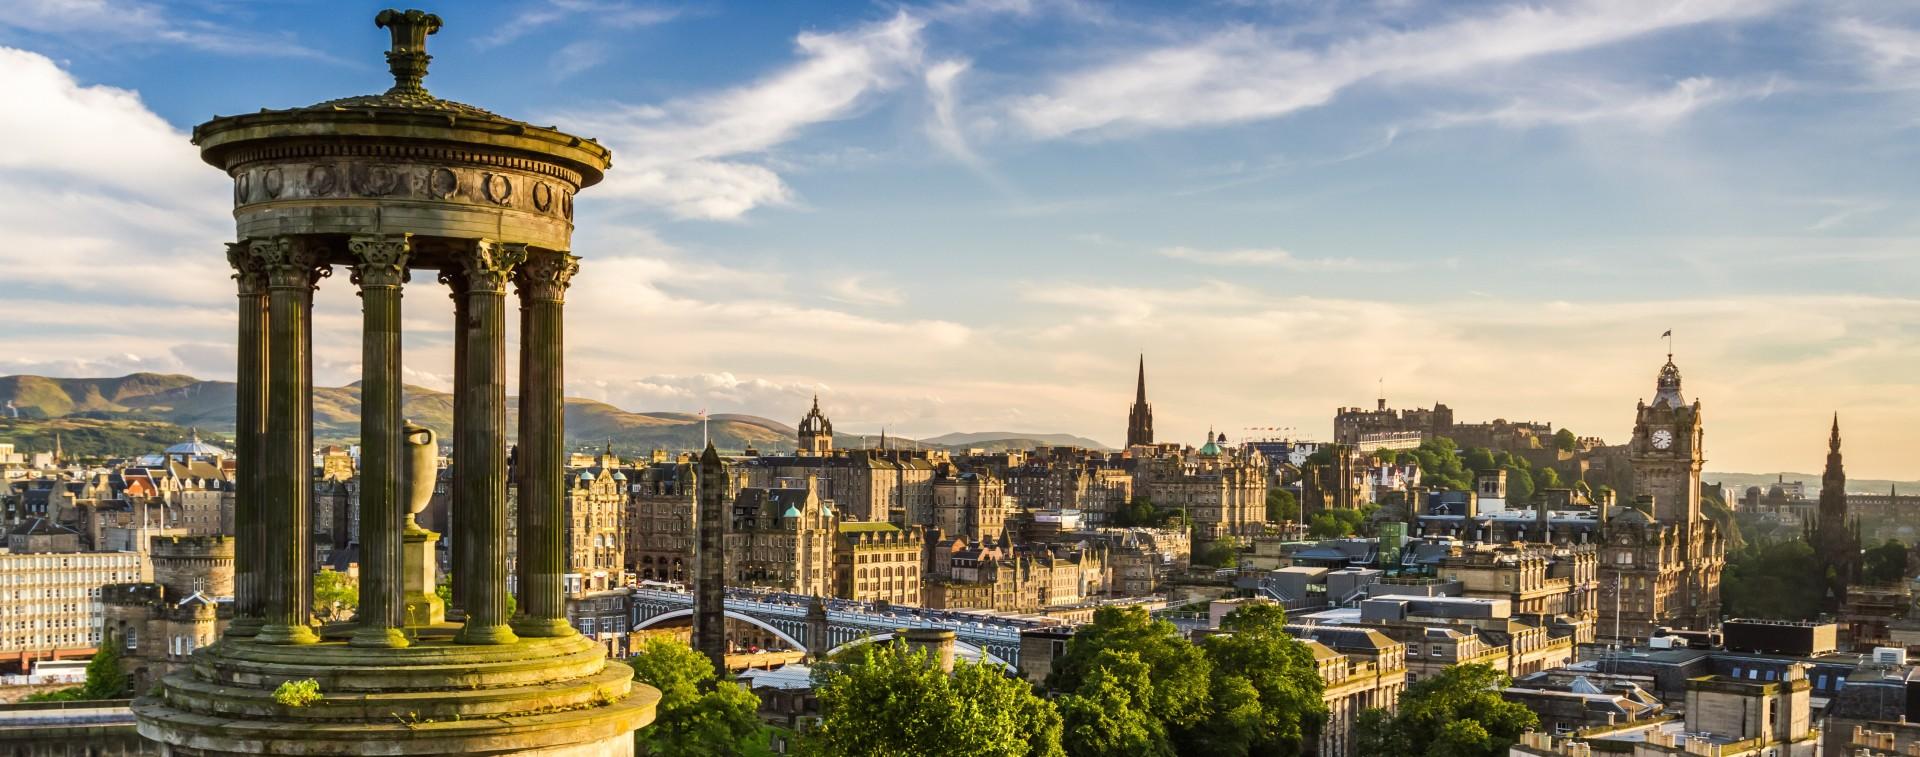 Edinburgh Video Production - 1